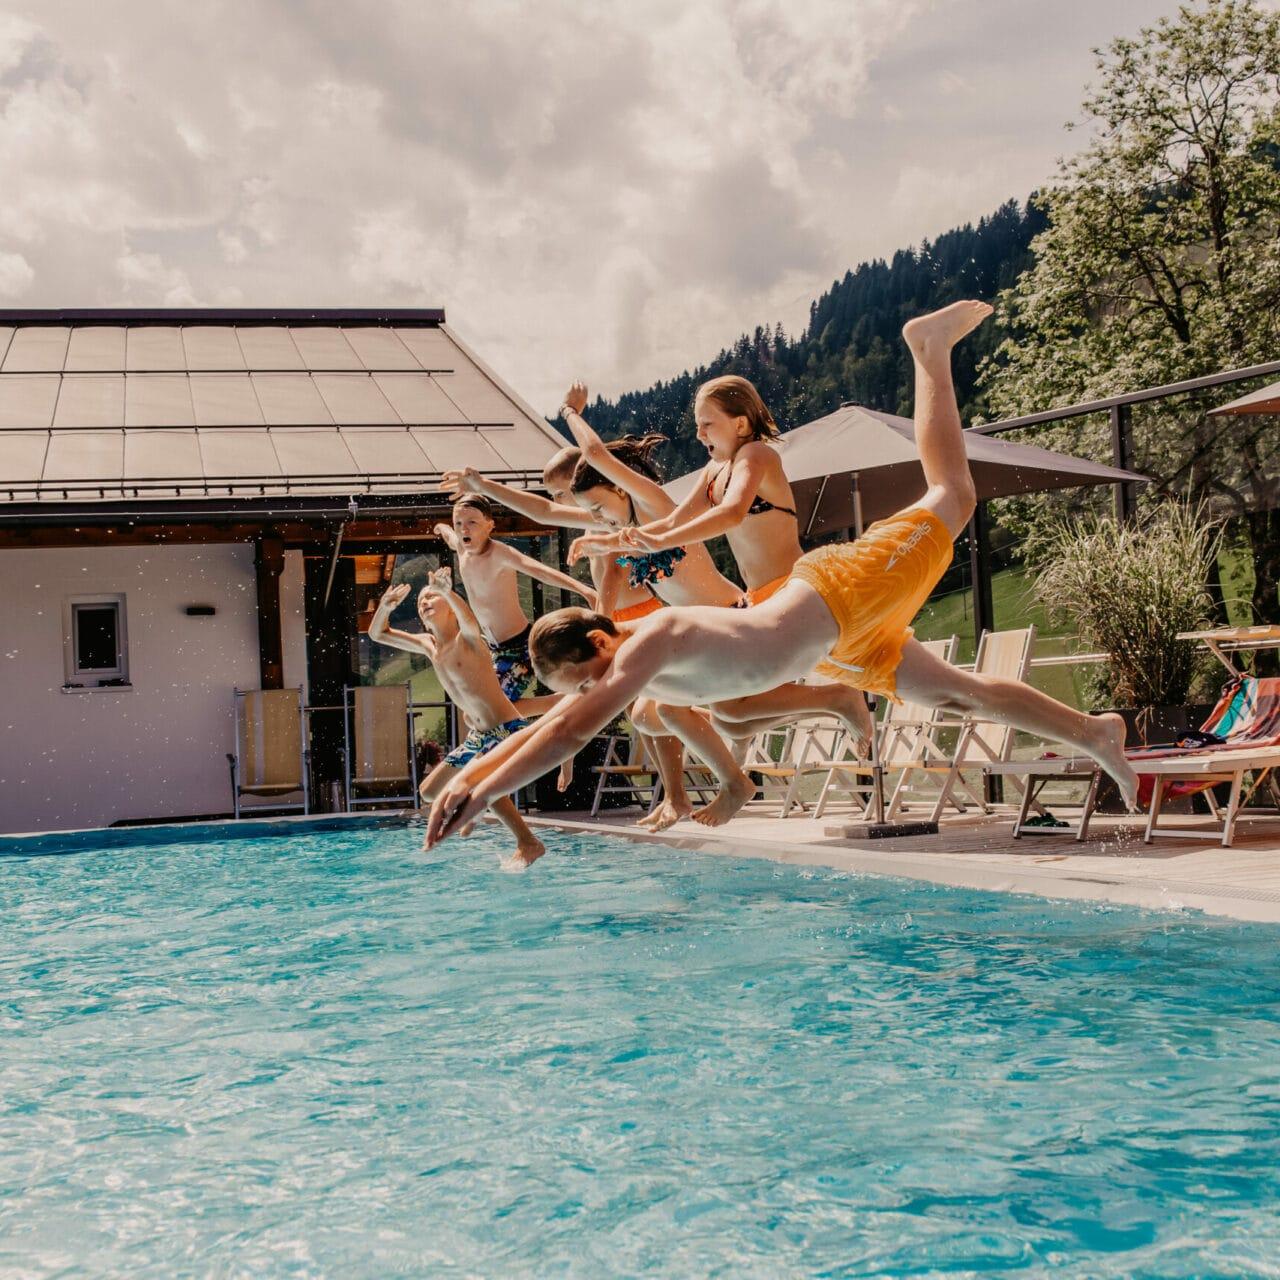 Hofgut-apartment-lifestyle-resort-wagrain-dachterrasse-pool-gross